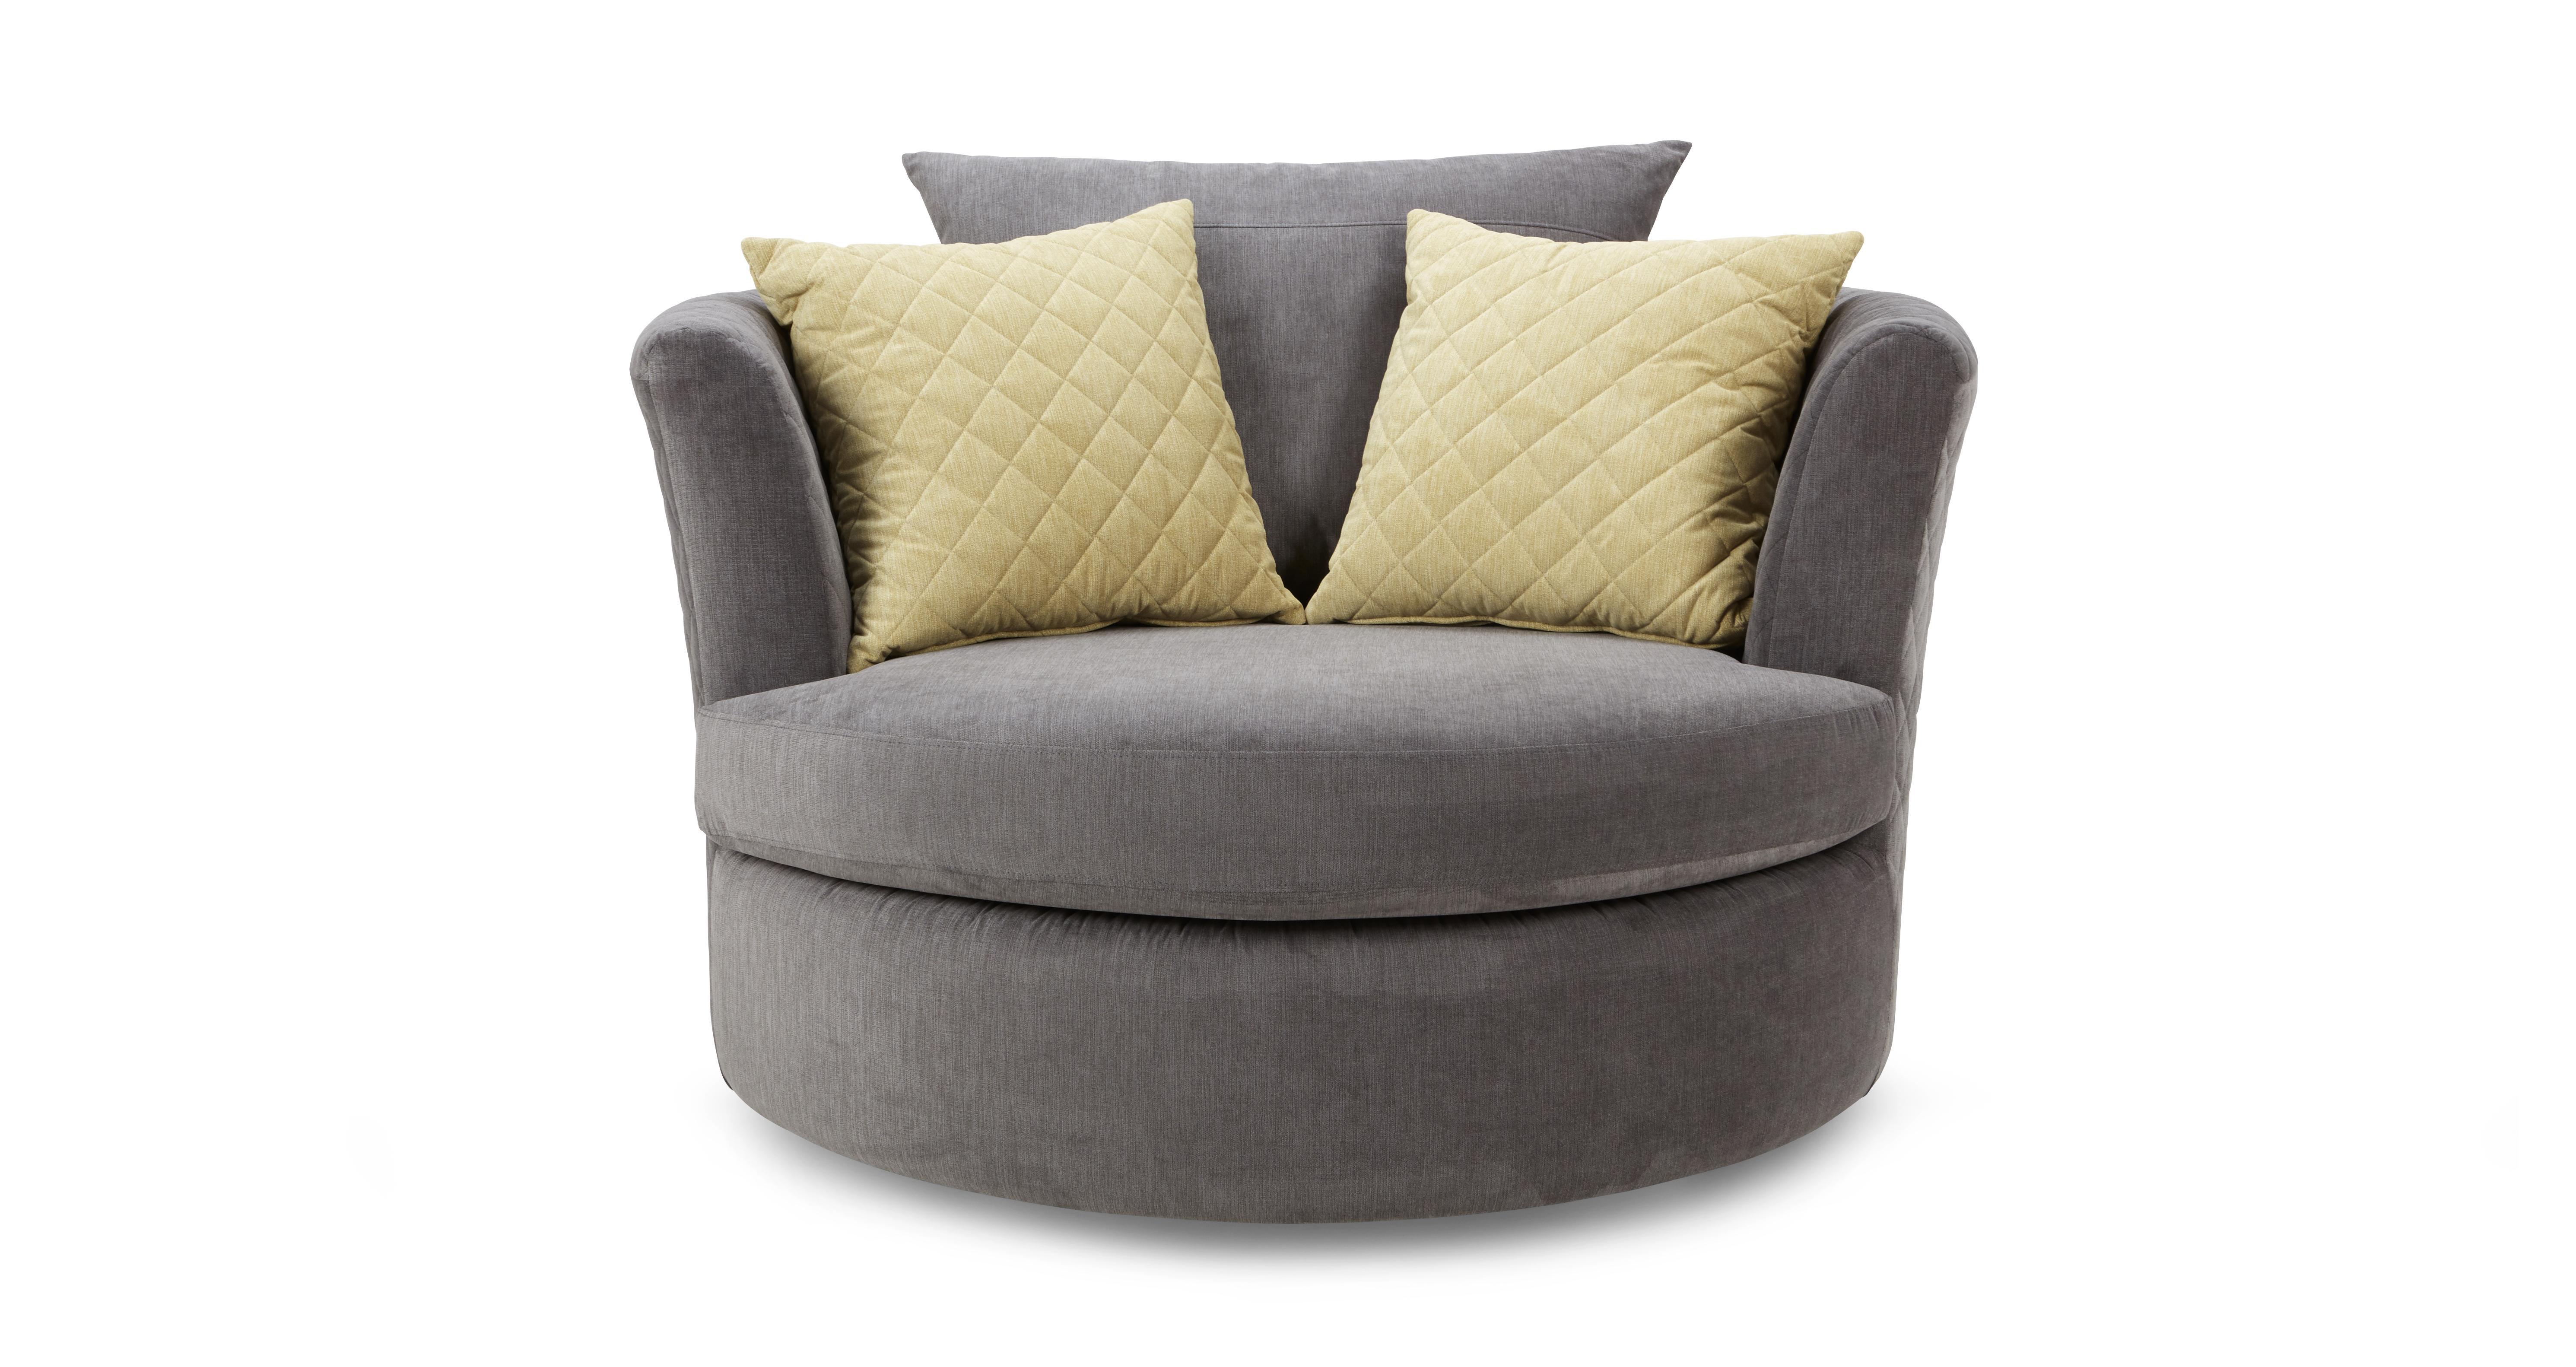 Astaire Swivel Chair Sherbet